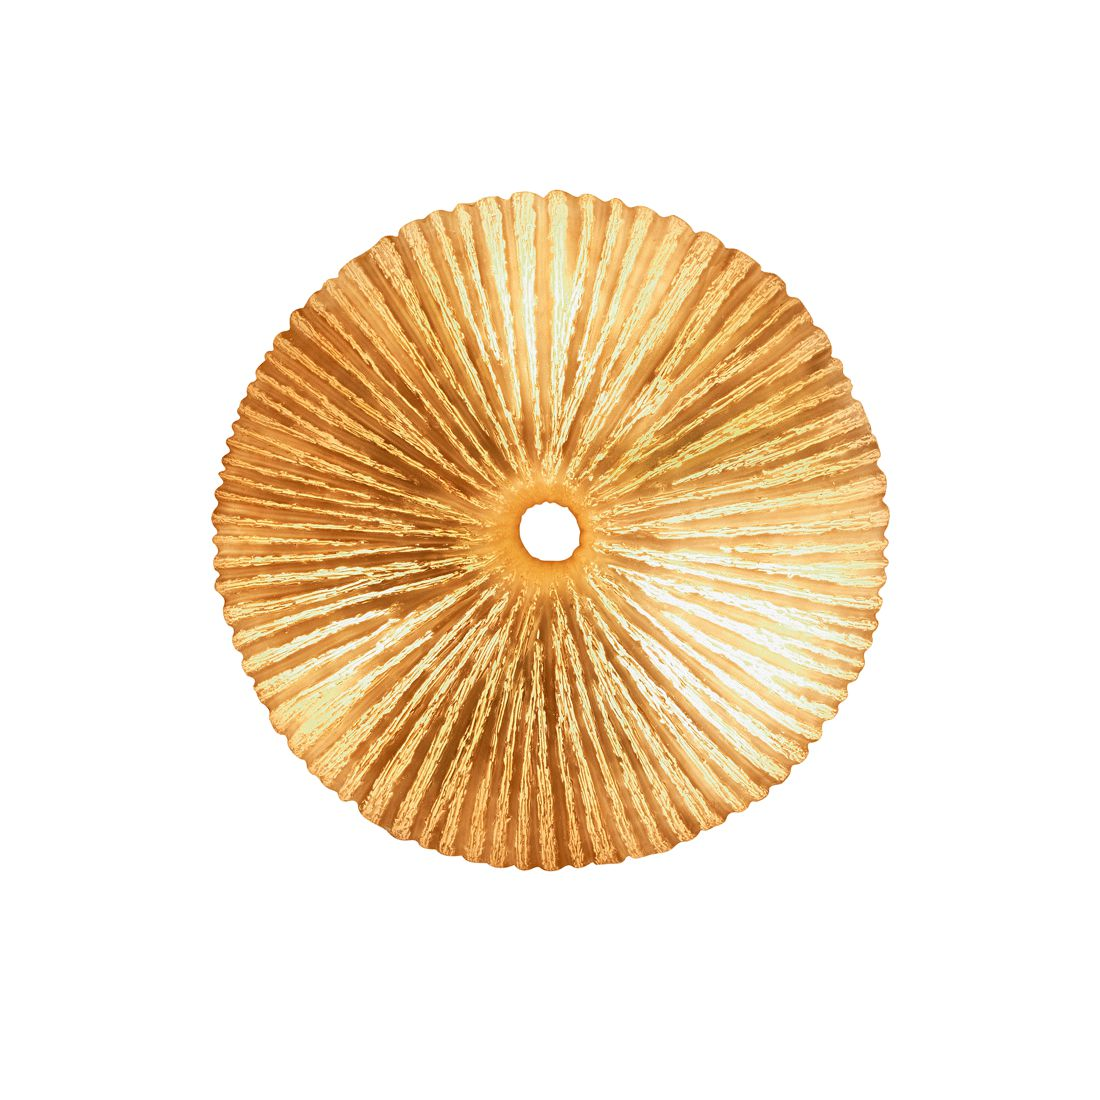 Wandleuchte Ammonit ● Metall/Glas ● Weiß- Pure Day A++